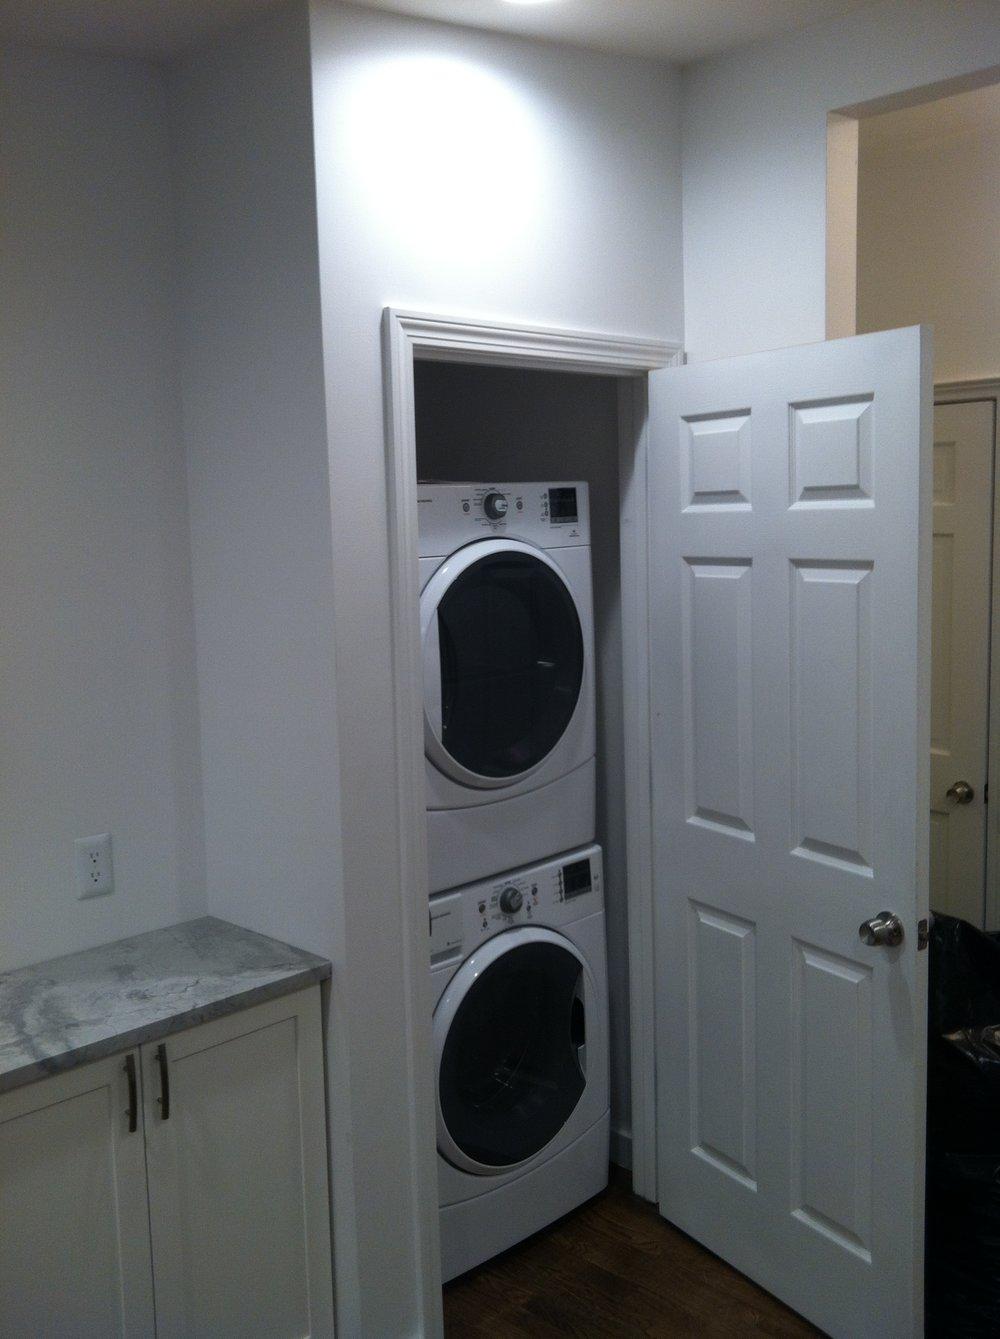 431 e 3rd In Unit Laundry.JPG